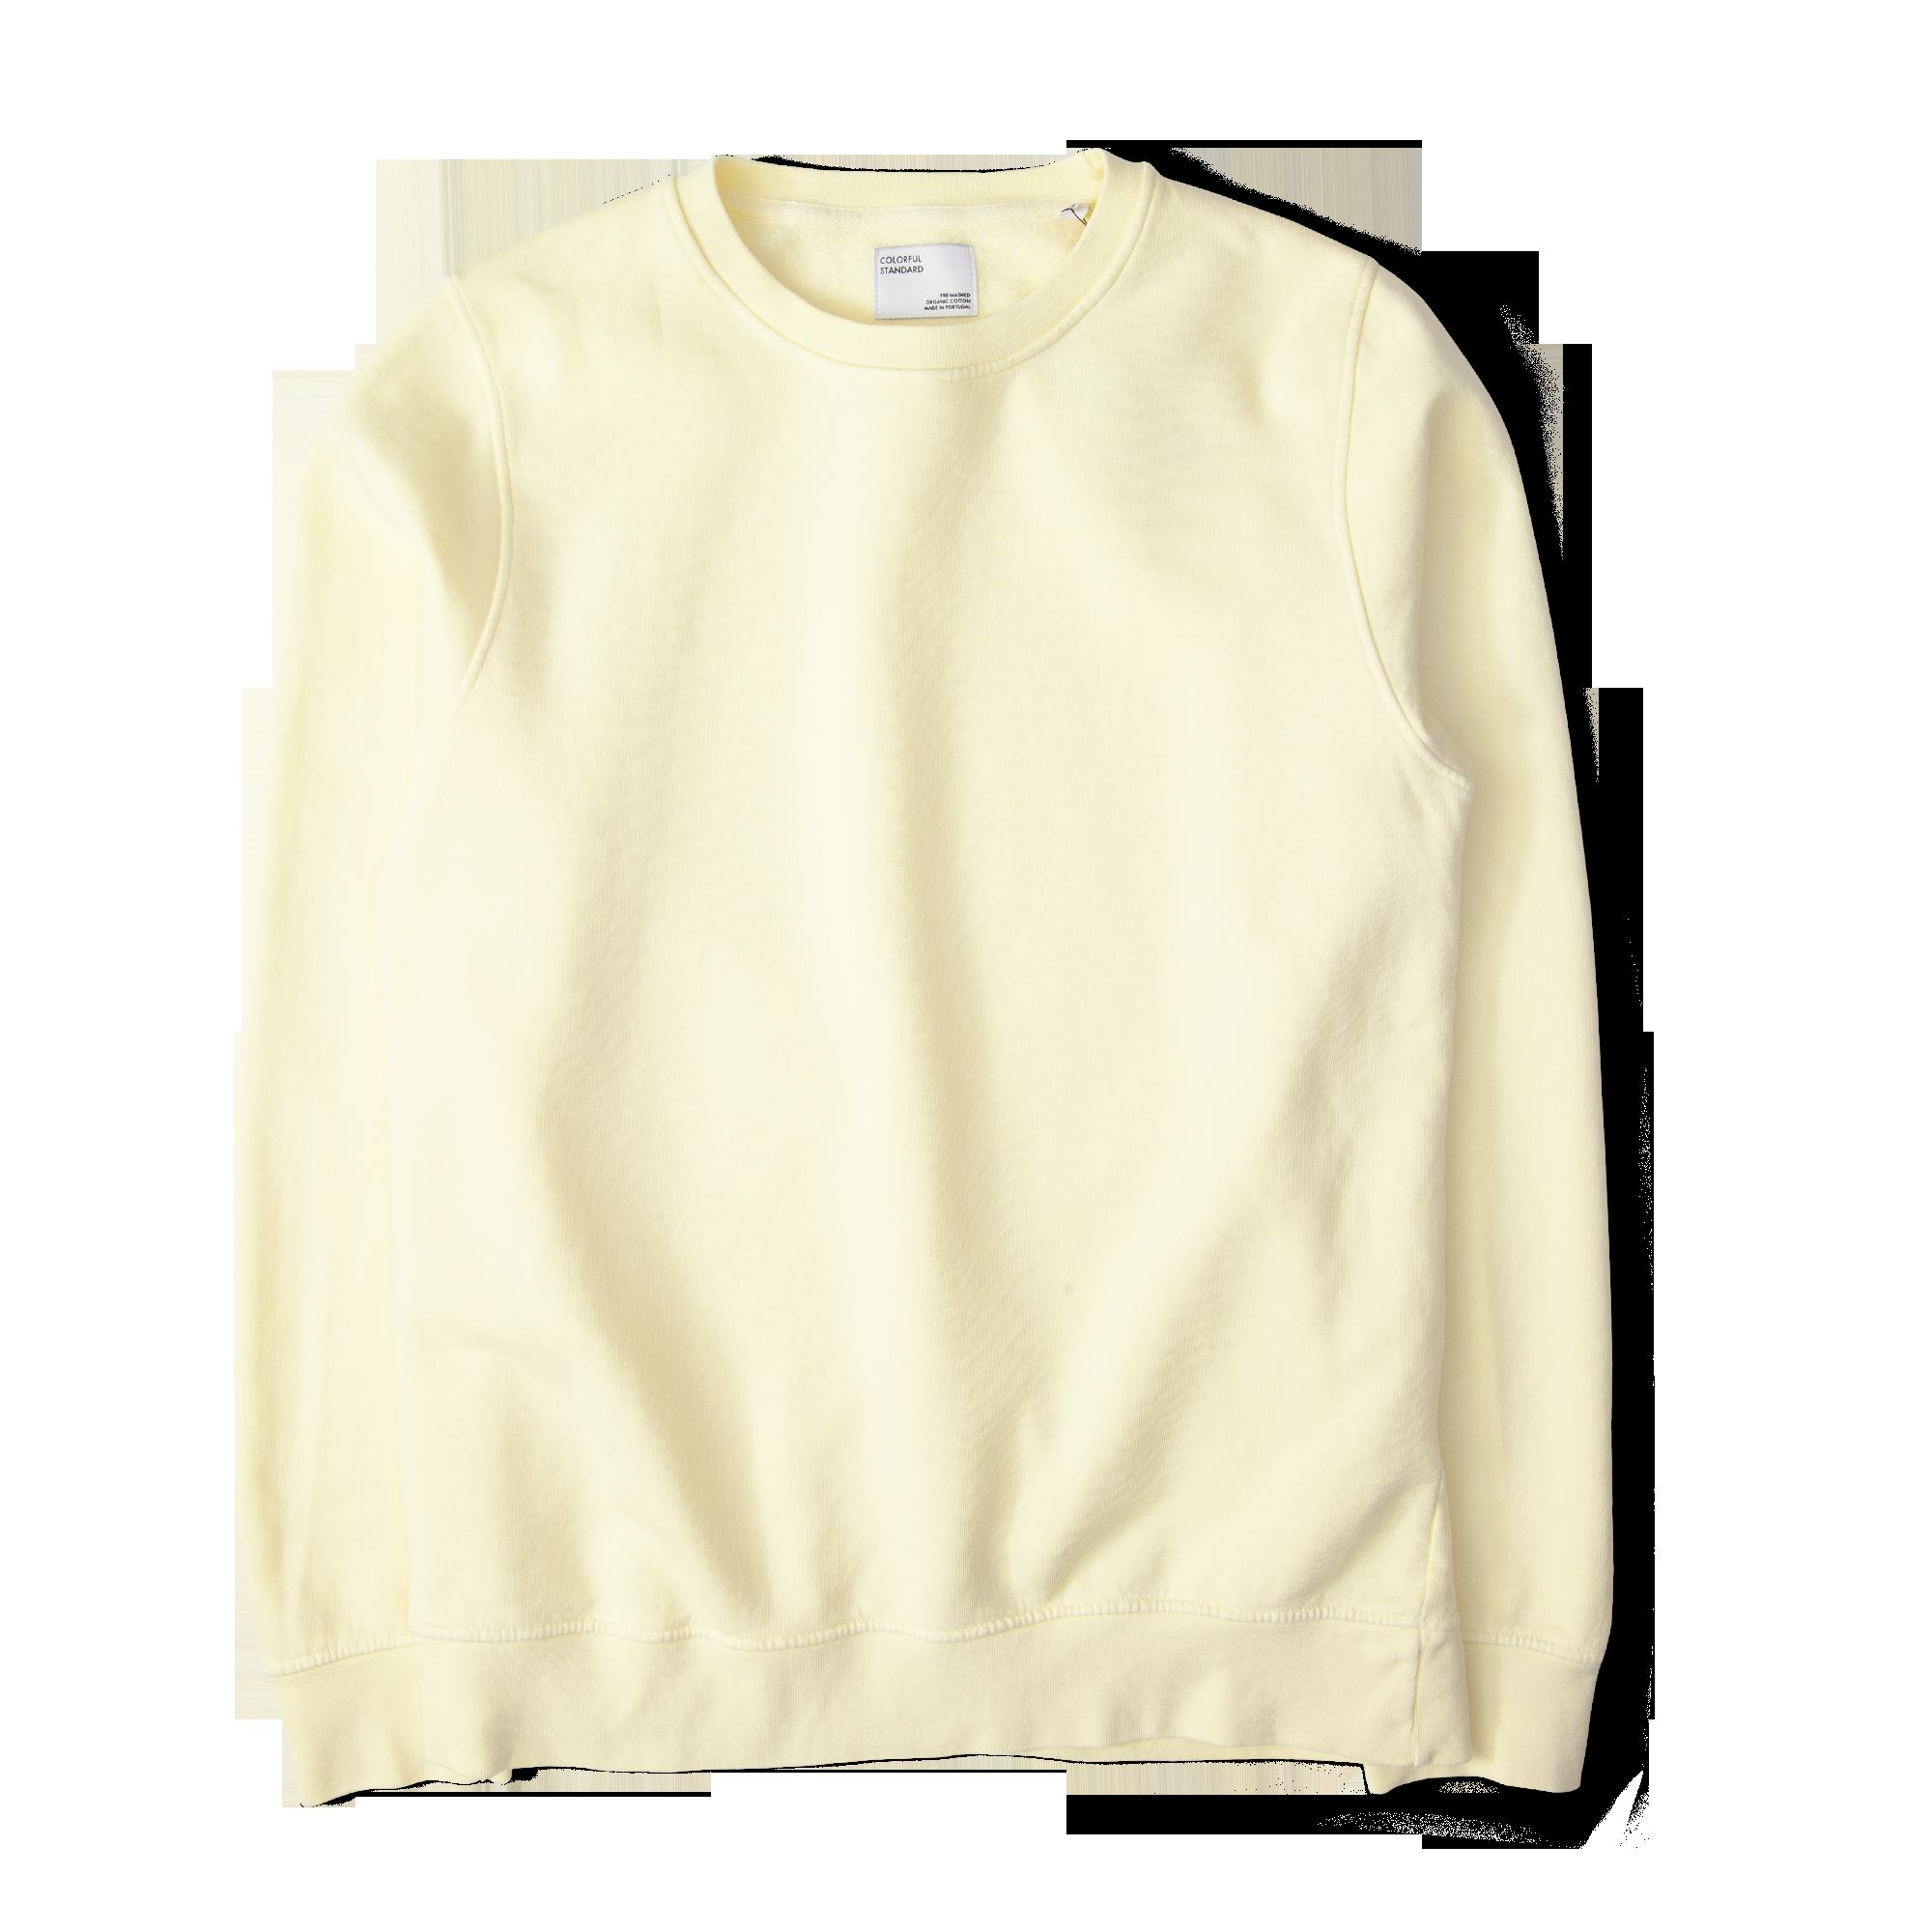 6f36b006ca99 Colourful Standard Classic Organic Crew Sweatshirt Soft Yellow Free  SHIPPING OVER £50.00 #grants1856 #